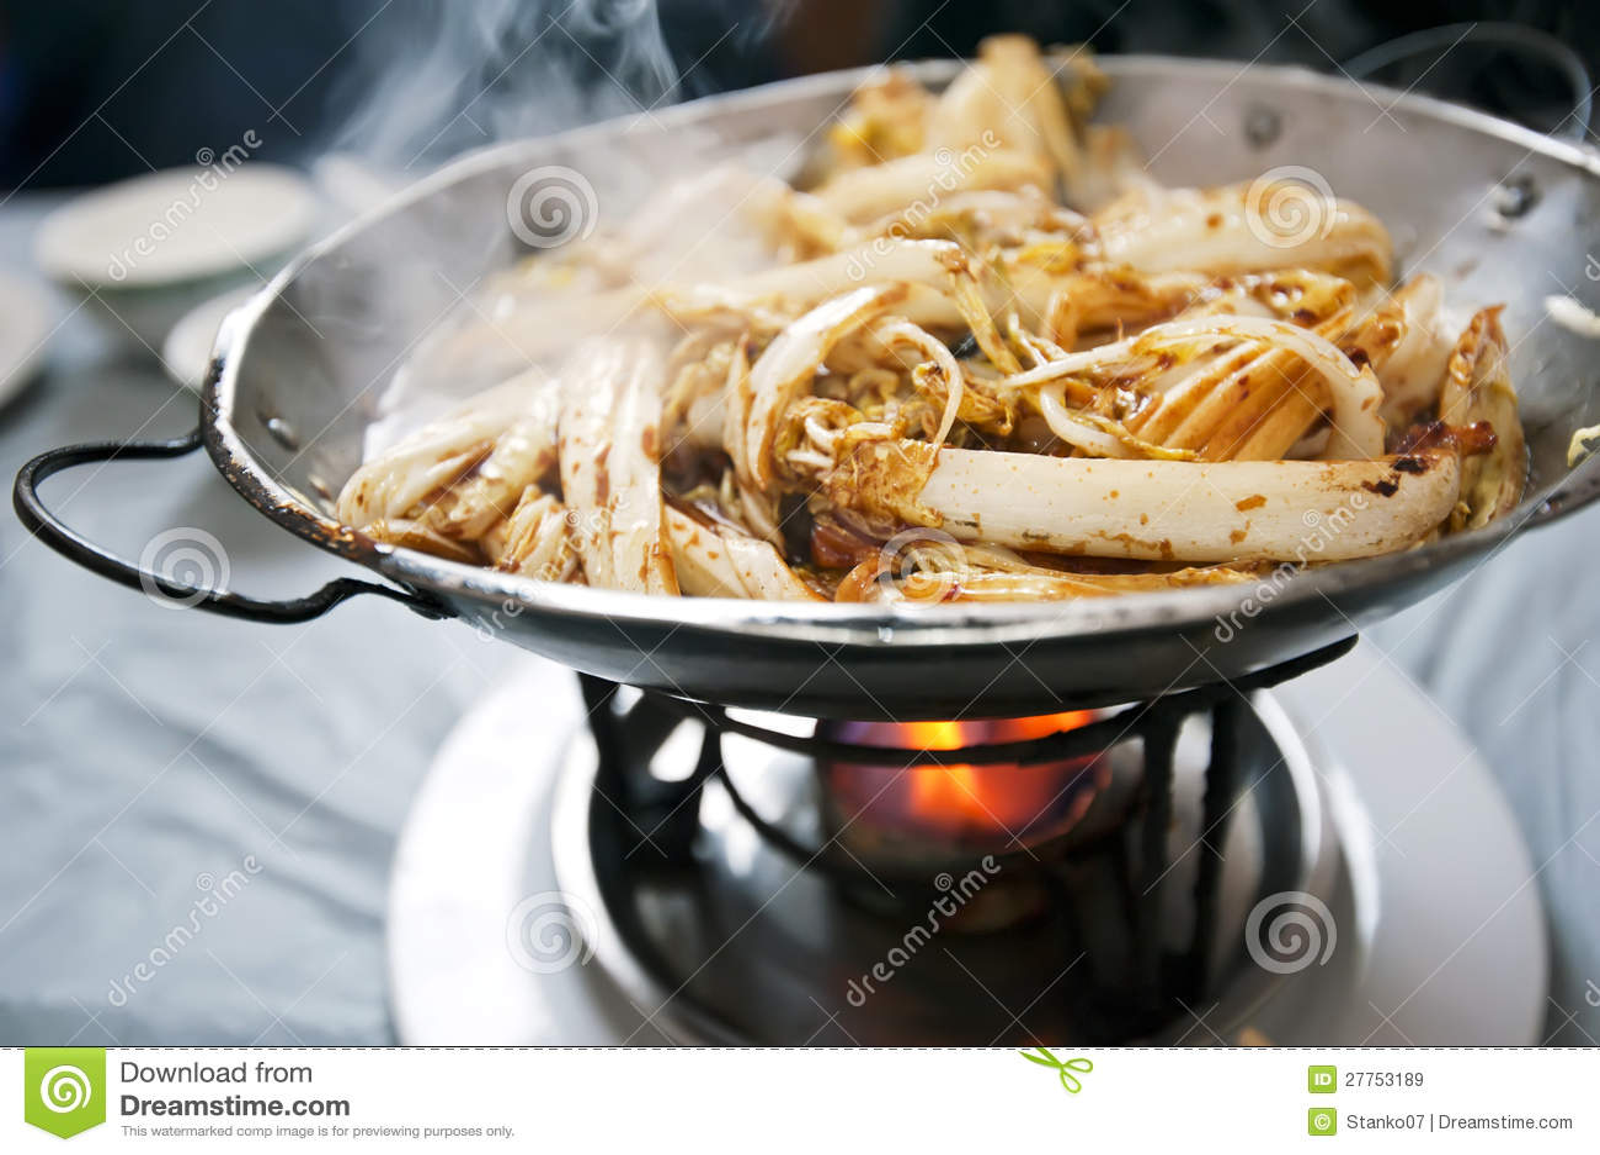 Cuisine chinoise - chou frit